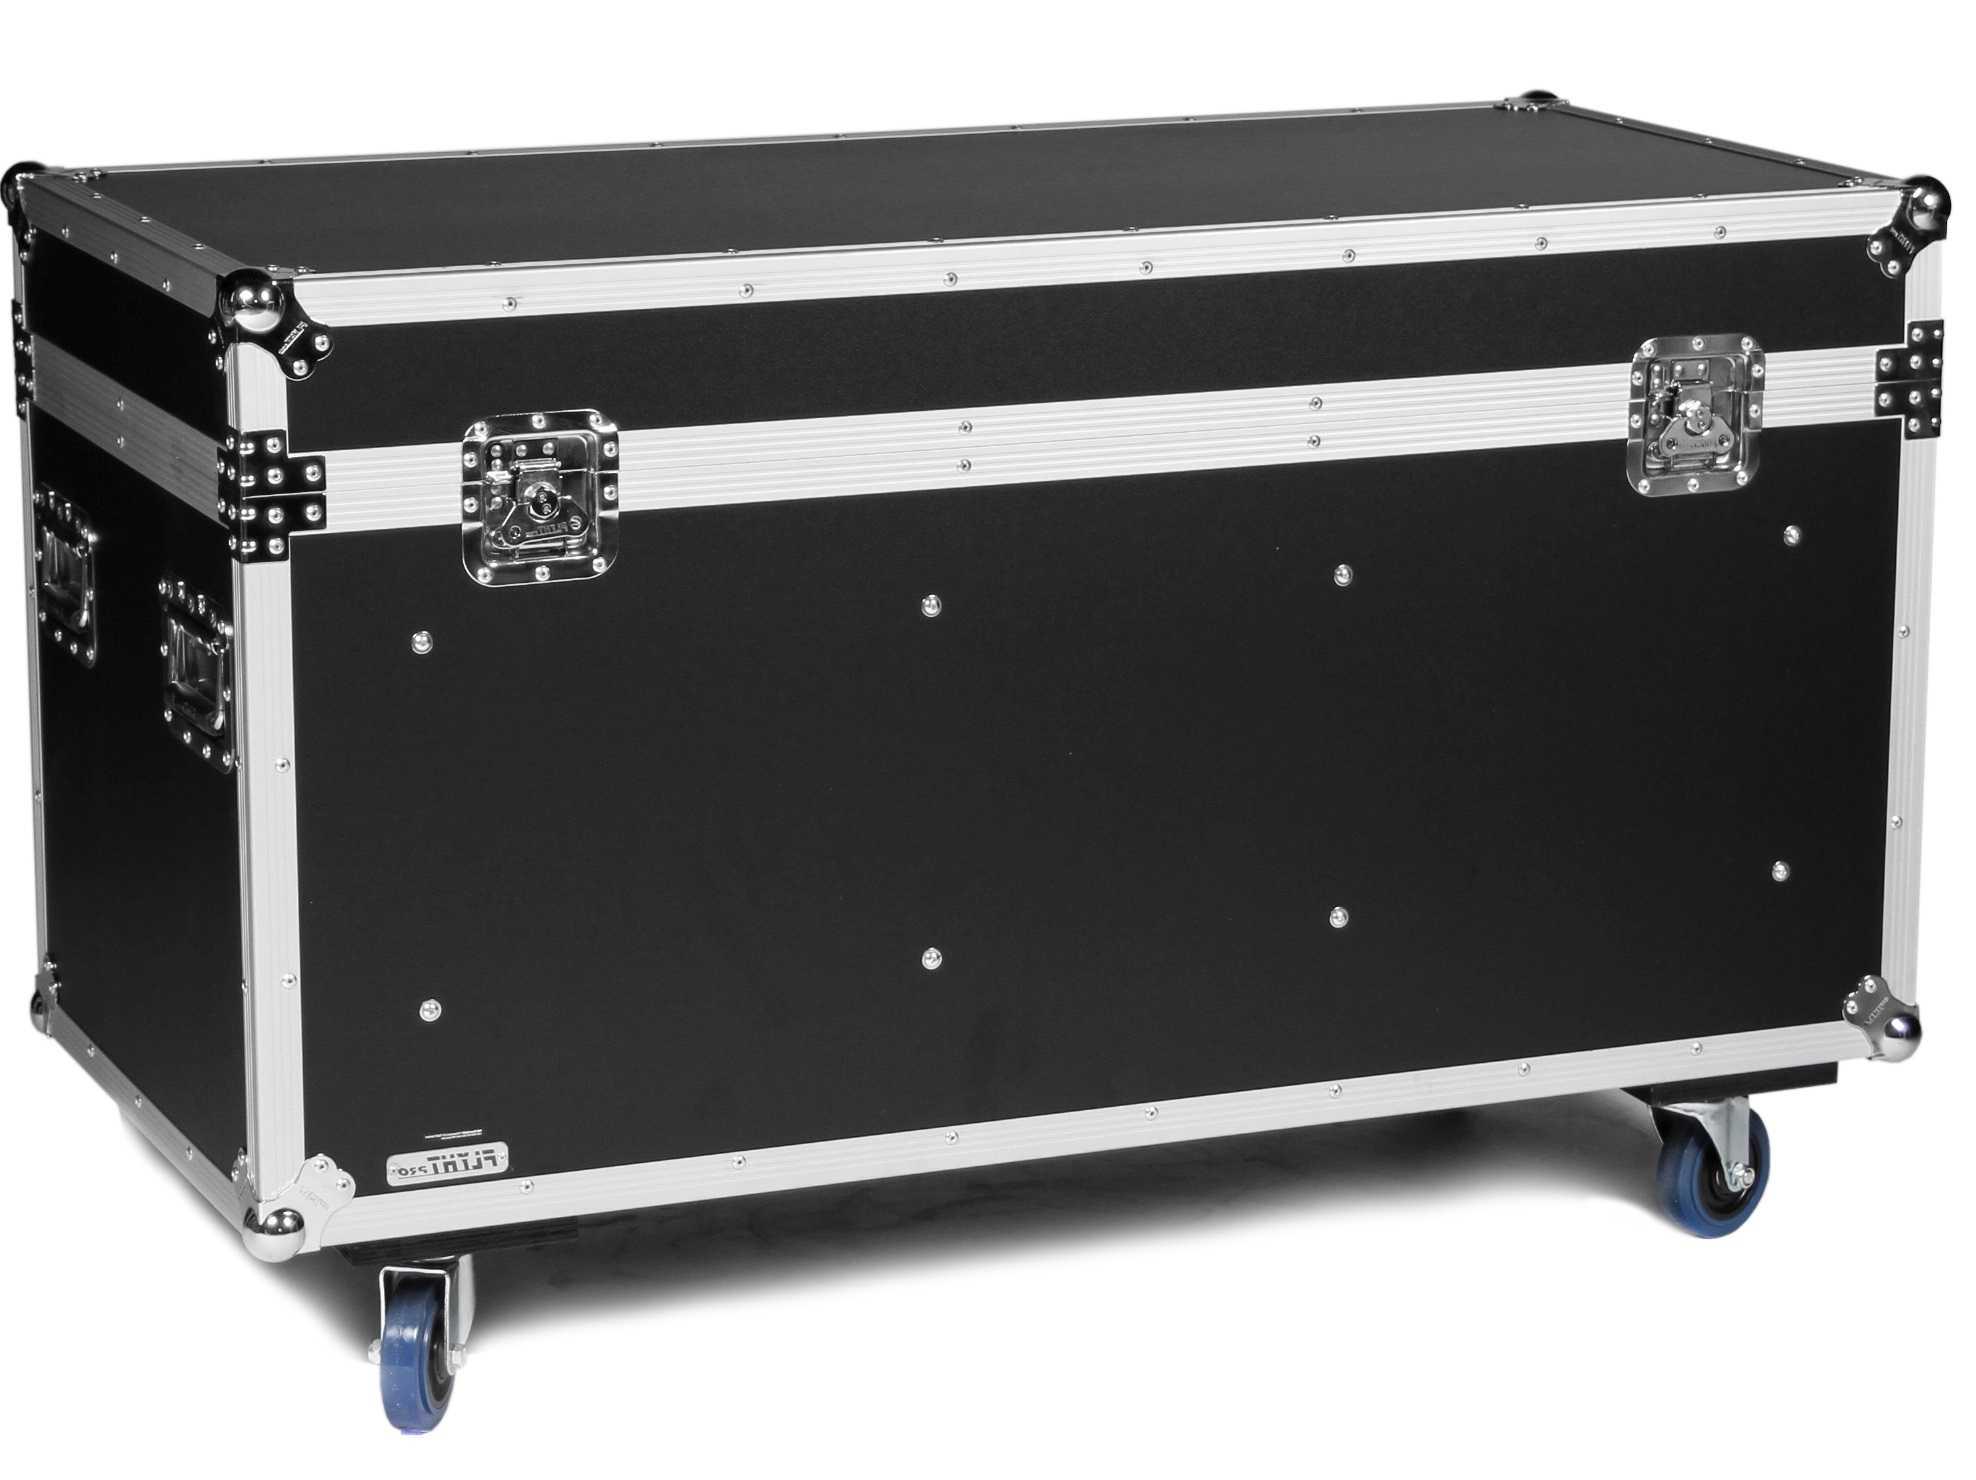 flyht universal tour case mit rollen 120 cm truhencase transportkiste tourcase ebay. Black Bedroom Furniture Sets. Home Design Ideas